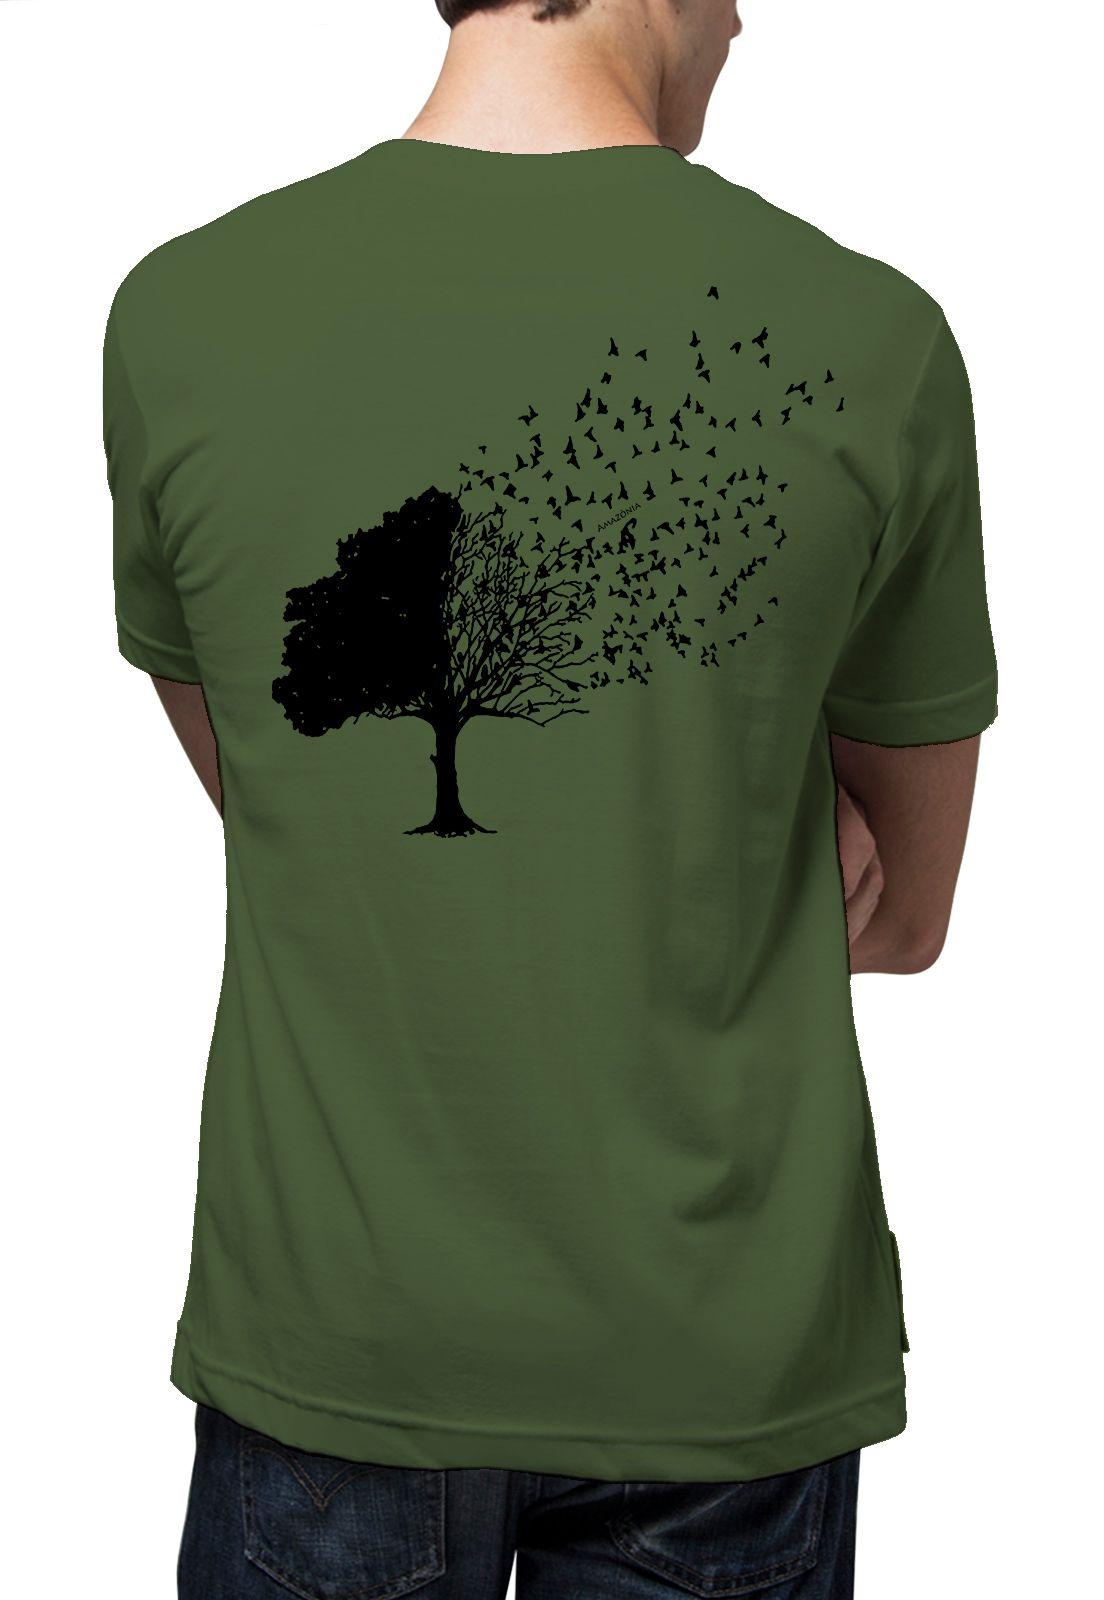 Camiseta Amazônia Árvore Pássaros - Verde Escuro